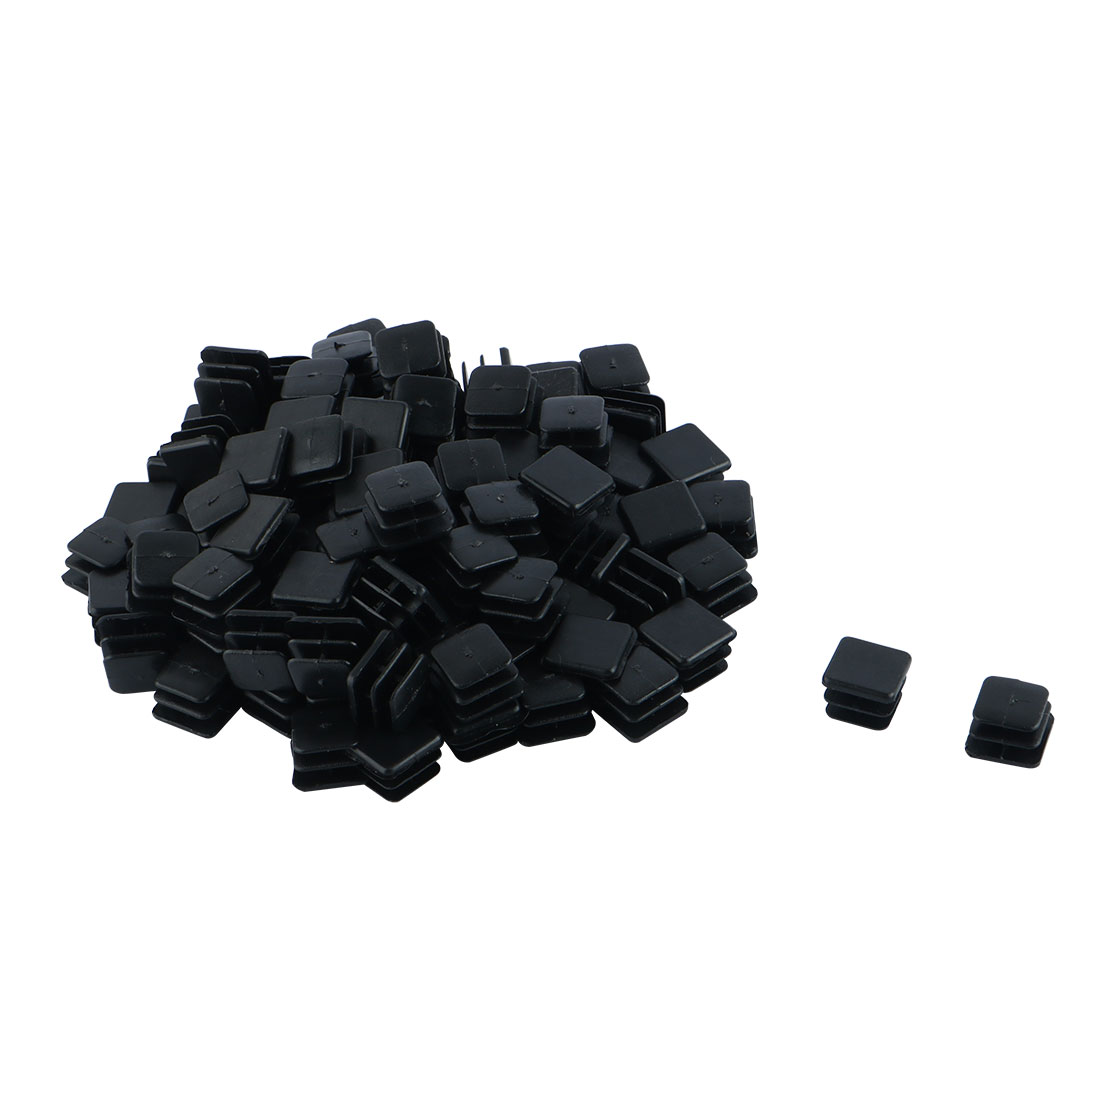 Table Chair Leg Plastic Square Tube Pipe Feet Insert Cap Black 15mm x 15mm 100 Pcs